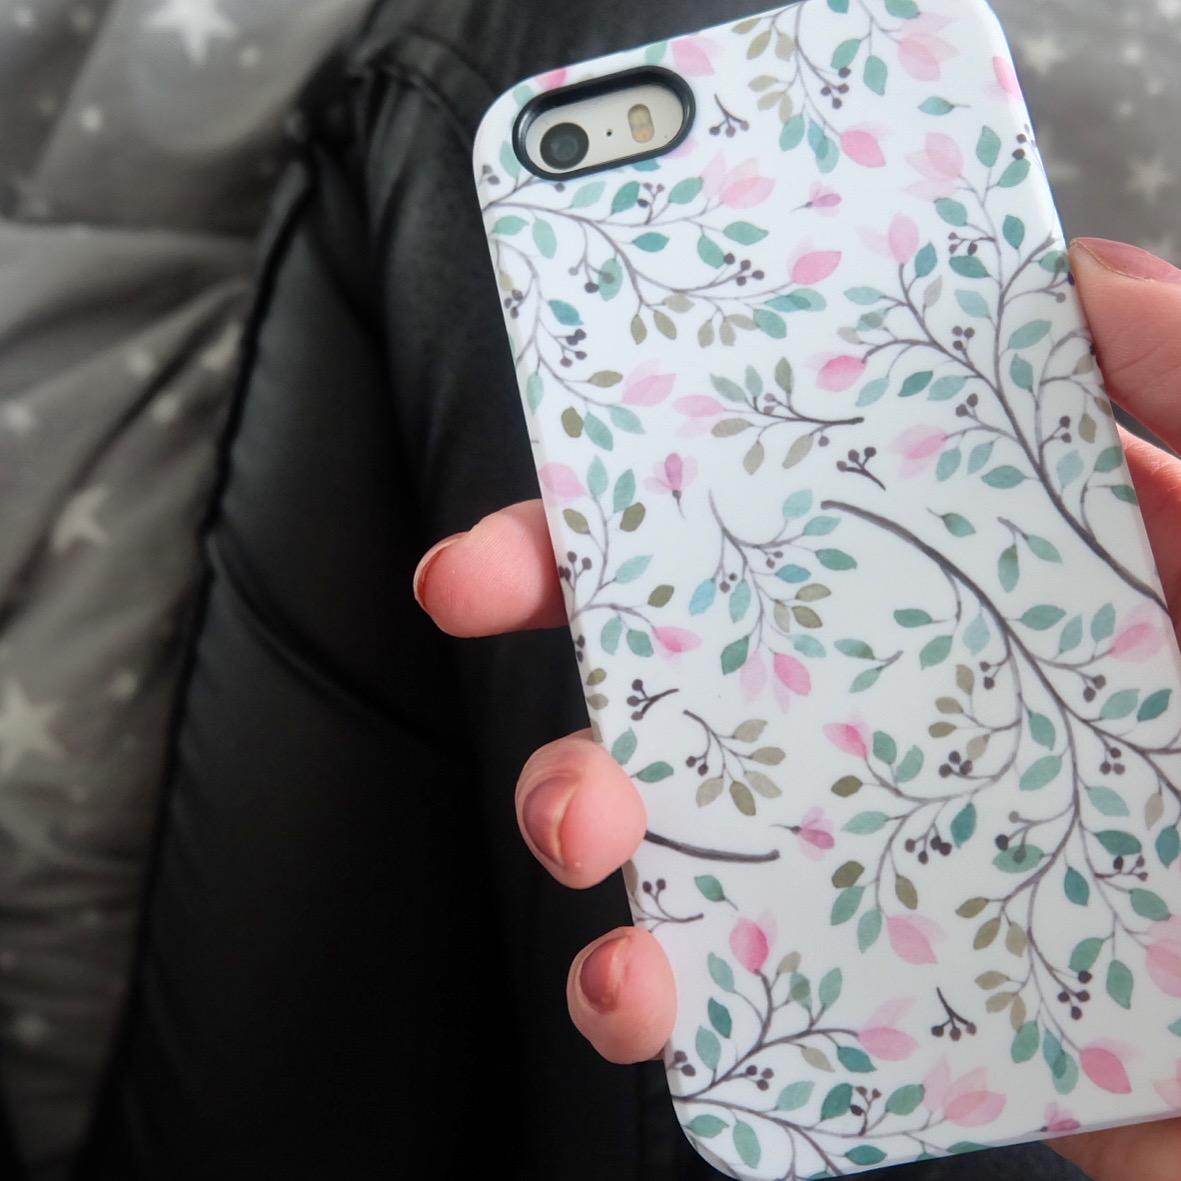 case company world iphone case